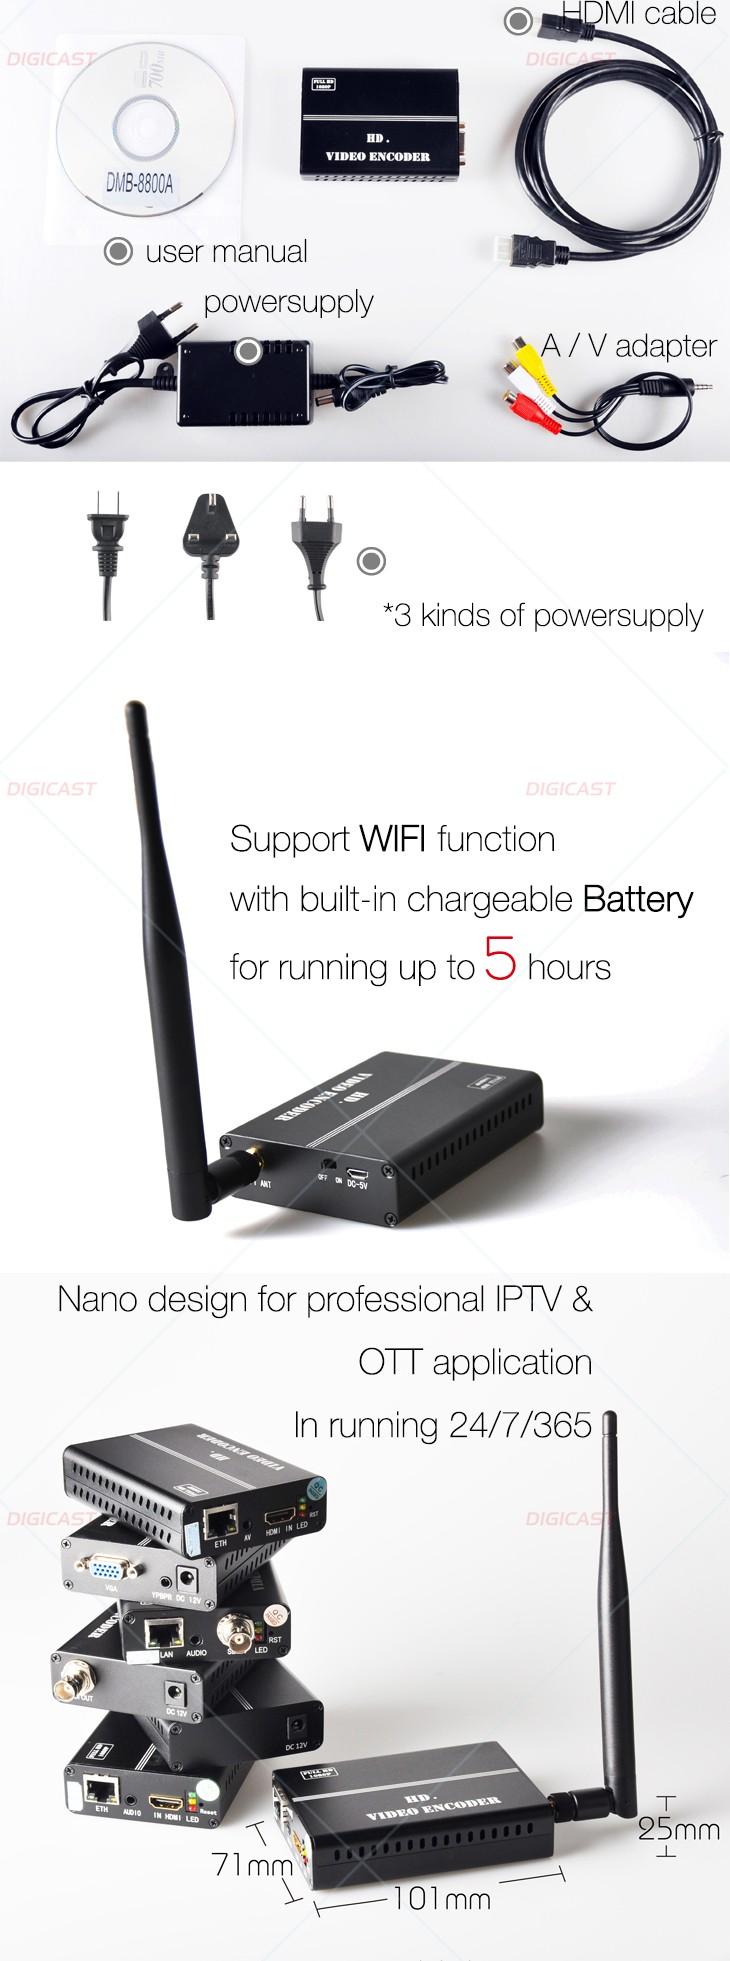 Iptv Streaming Server Ip Video Cable Tv Digital Encoder H 264 Iptv Cable Tv  Encoder For Wowza/flash/youtube/ustream - Buy Hd-mi Encoder,Iptv